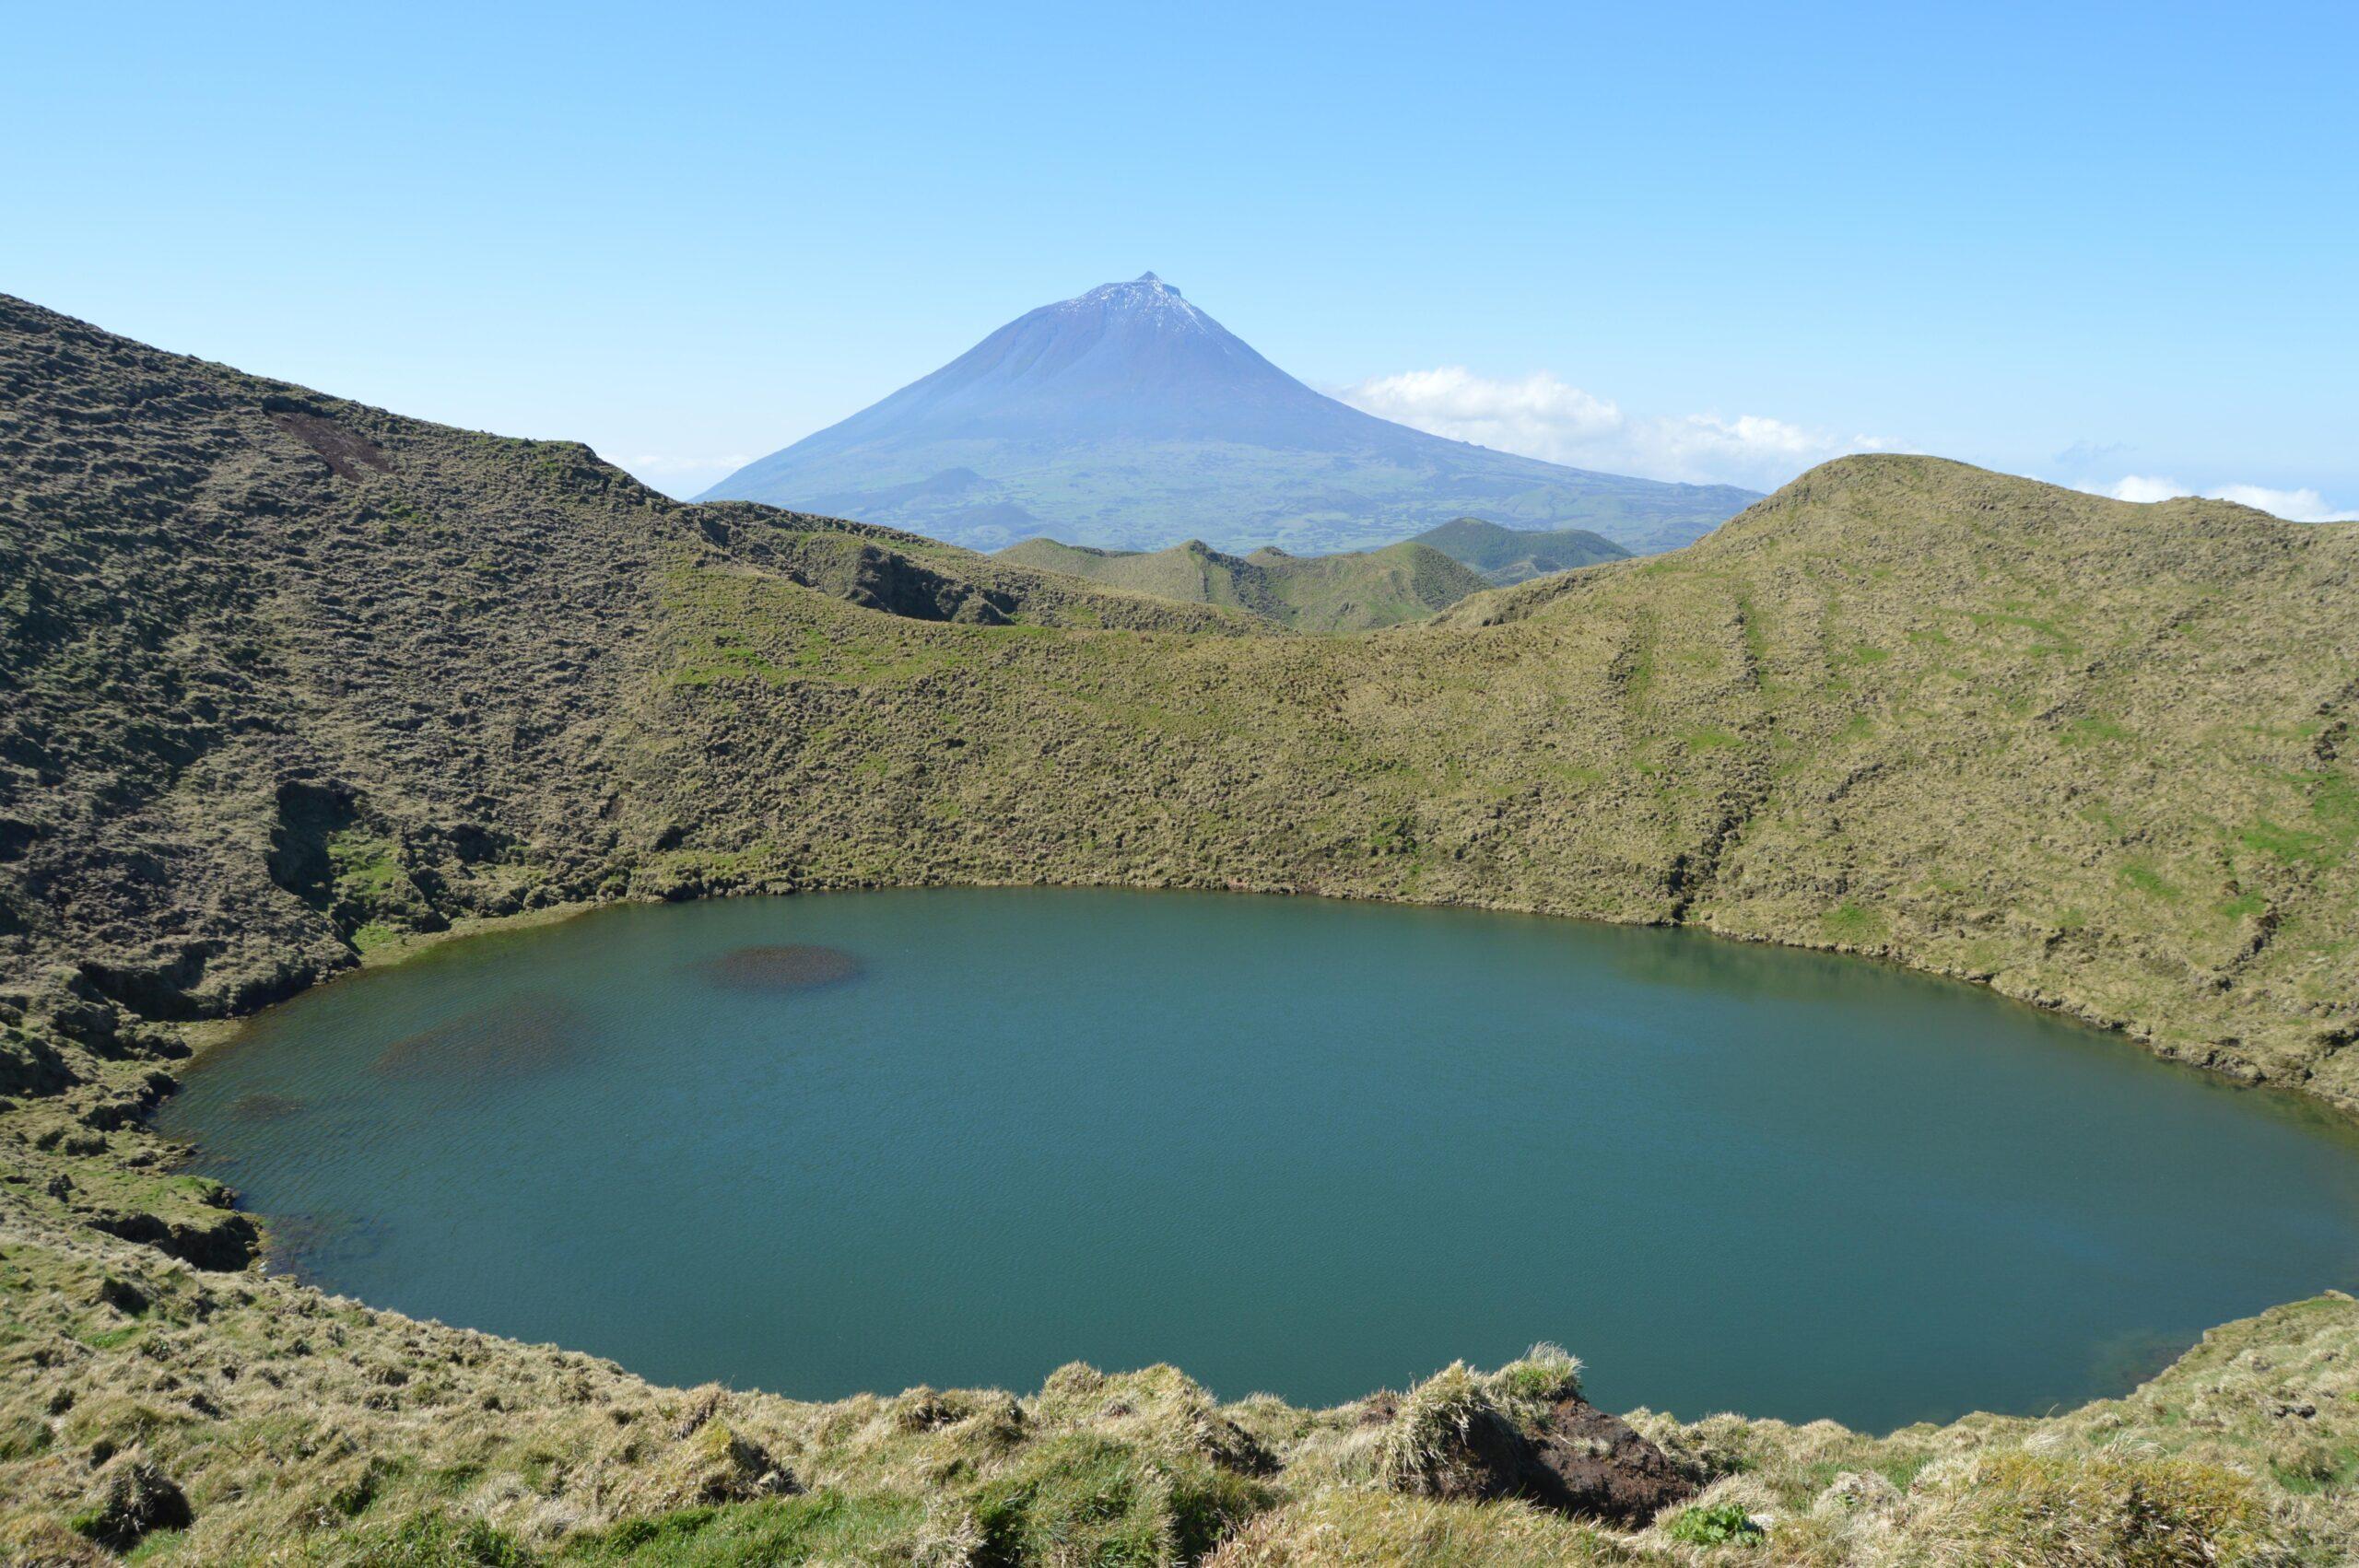 Lagoas do Pico